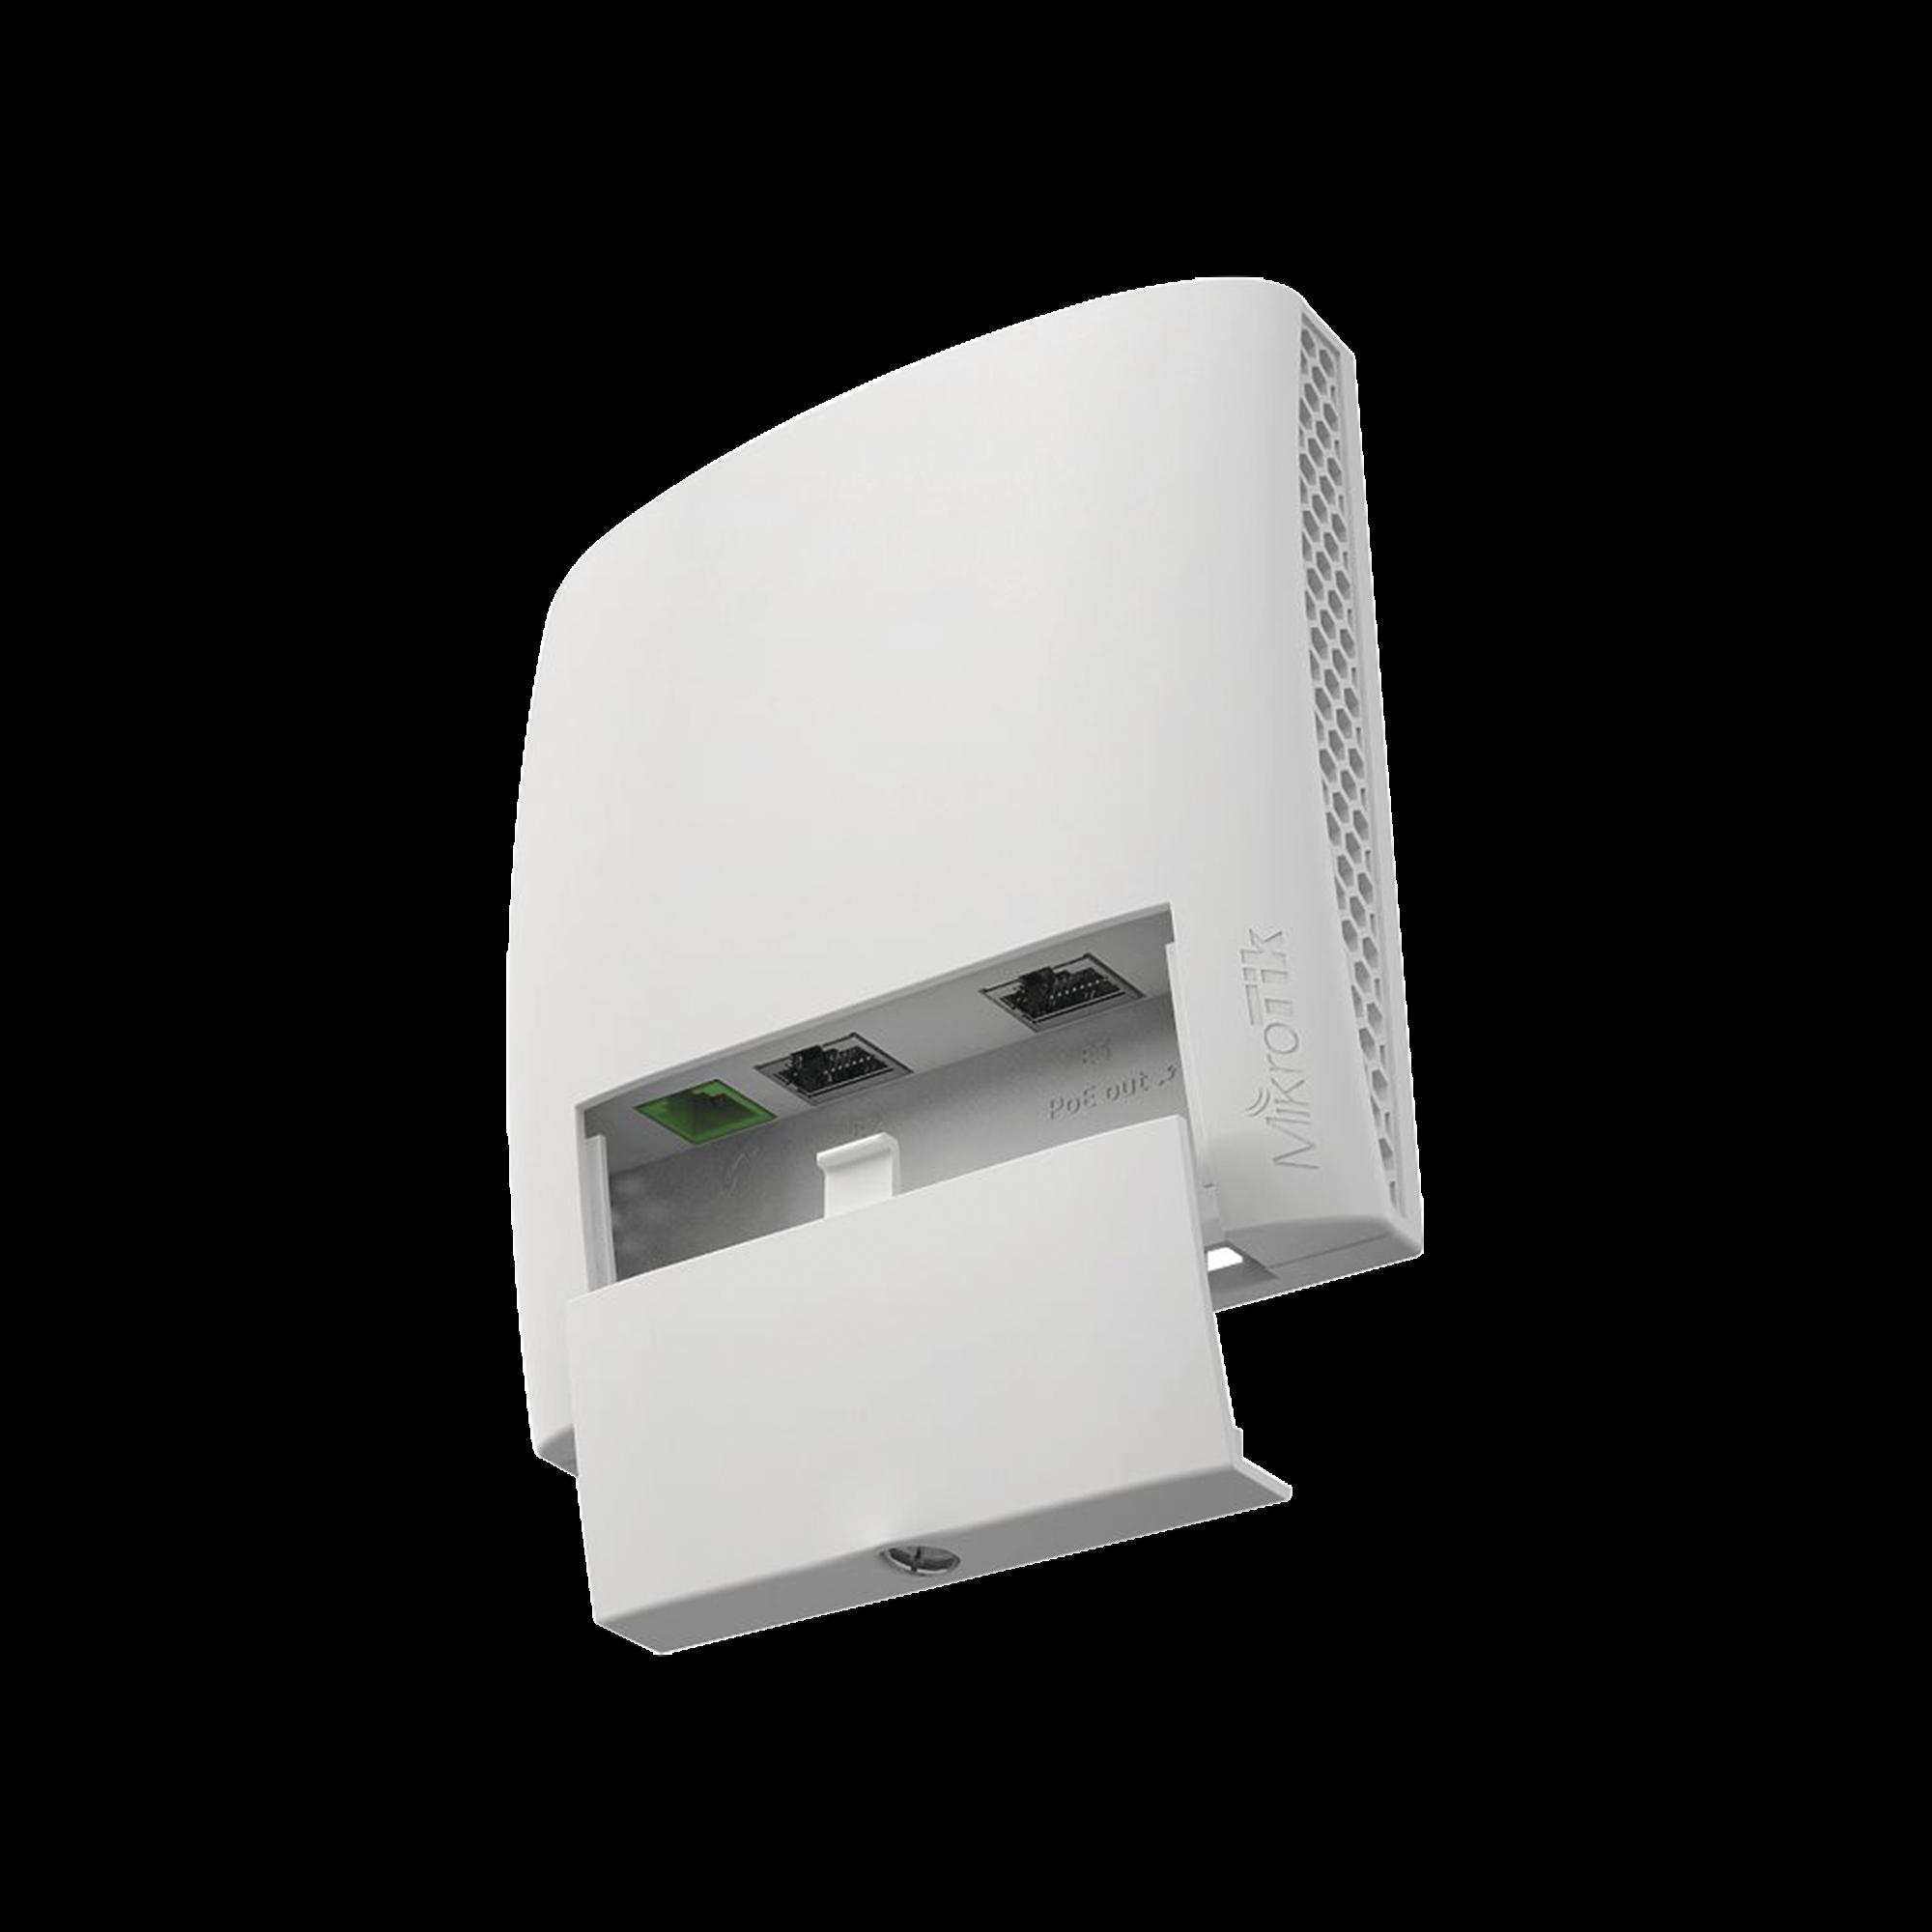 (wsAP ac lite) Punto de Acceso WiFi para Pared, Doble banda simultánea en 2.4 y 5 GHz b/g/n/ac